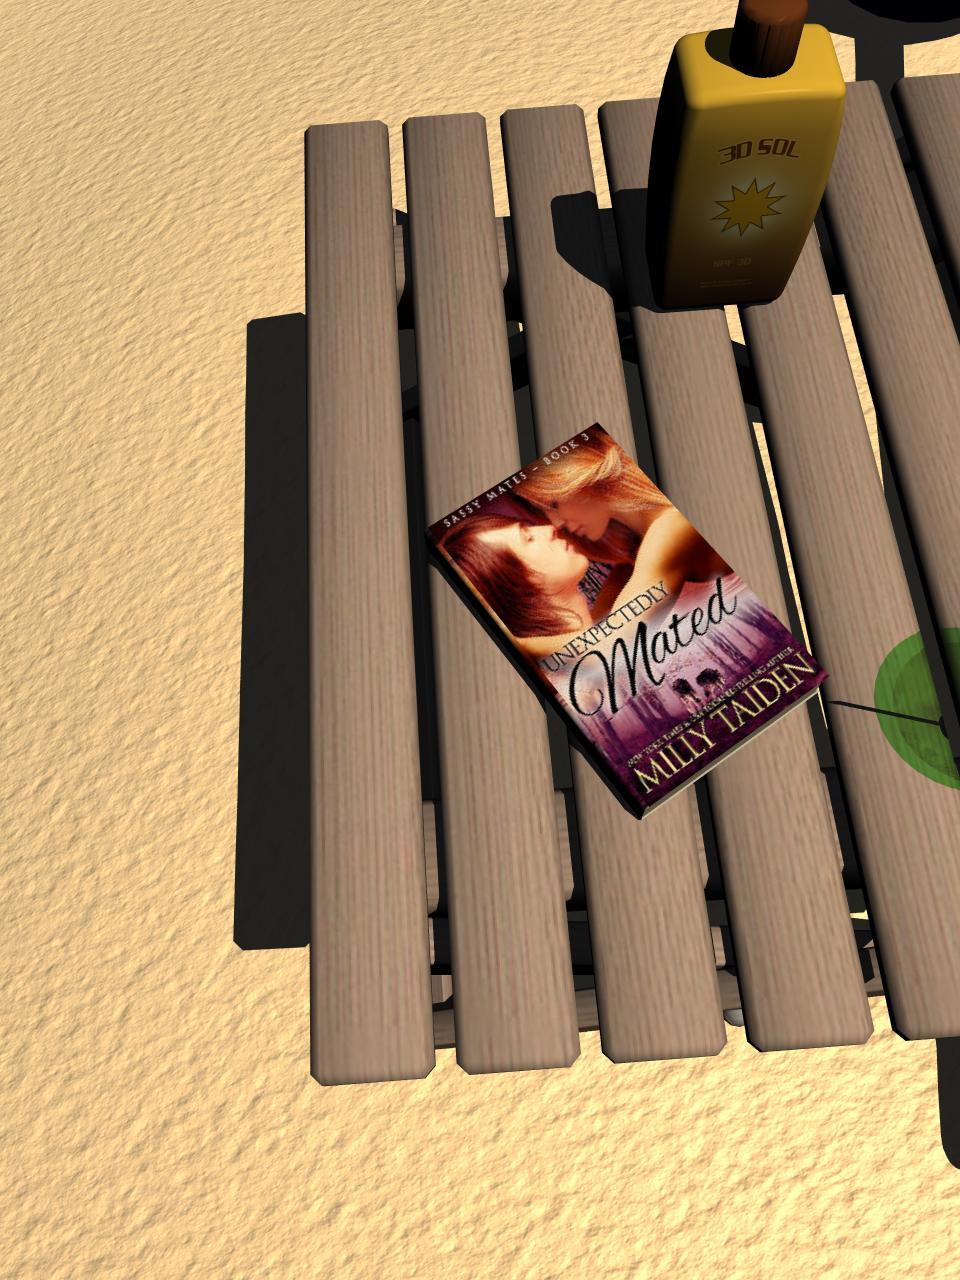 Unexpectedly Mated: Sassy Mates Book3